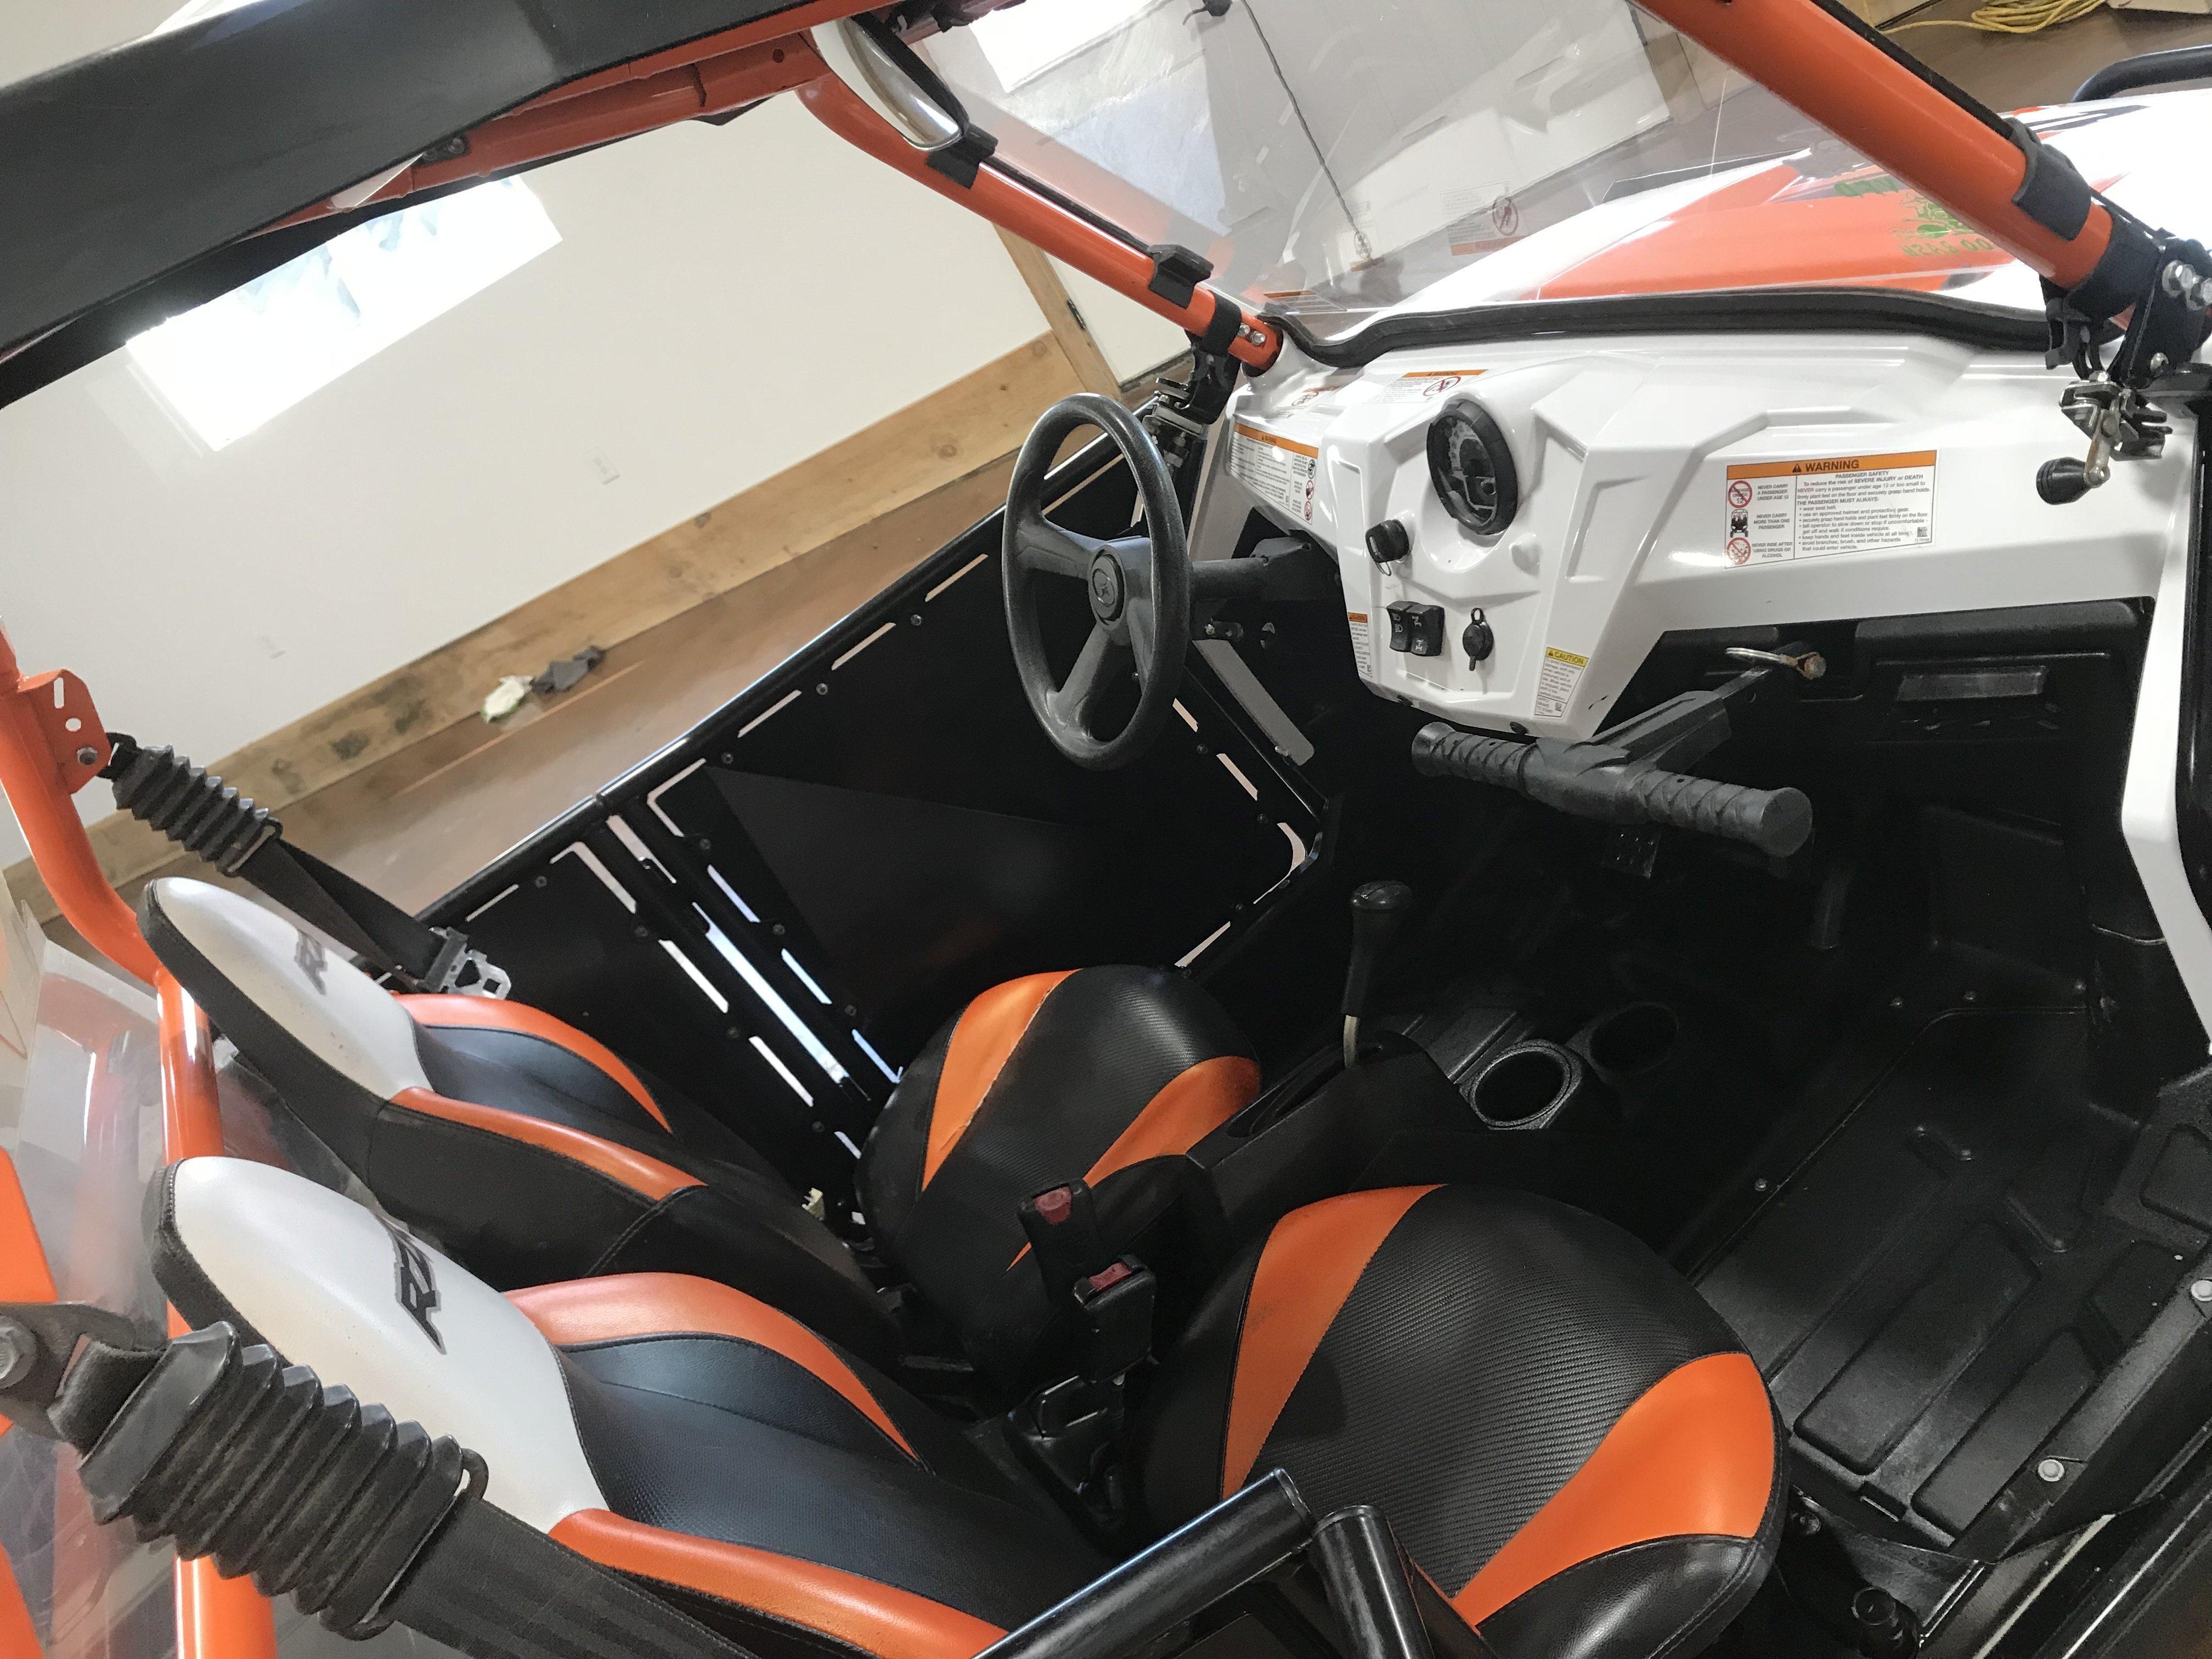 2013 Polaris RZR-S 800 Limited Edition